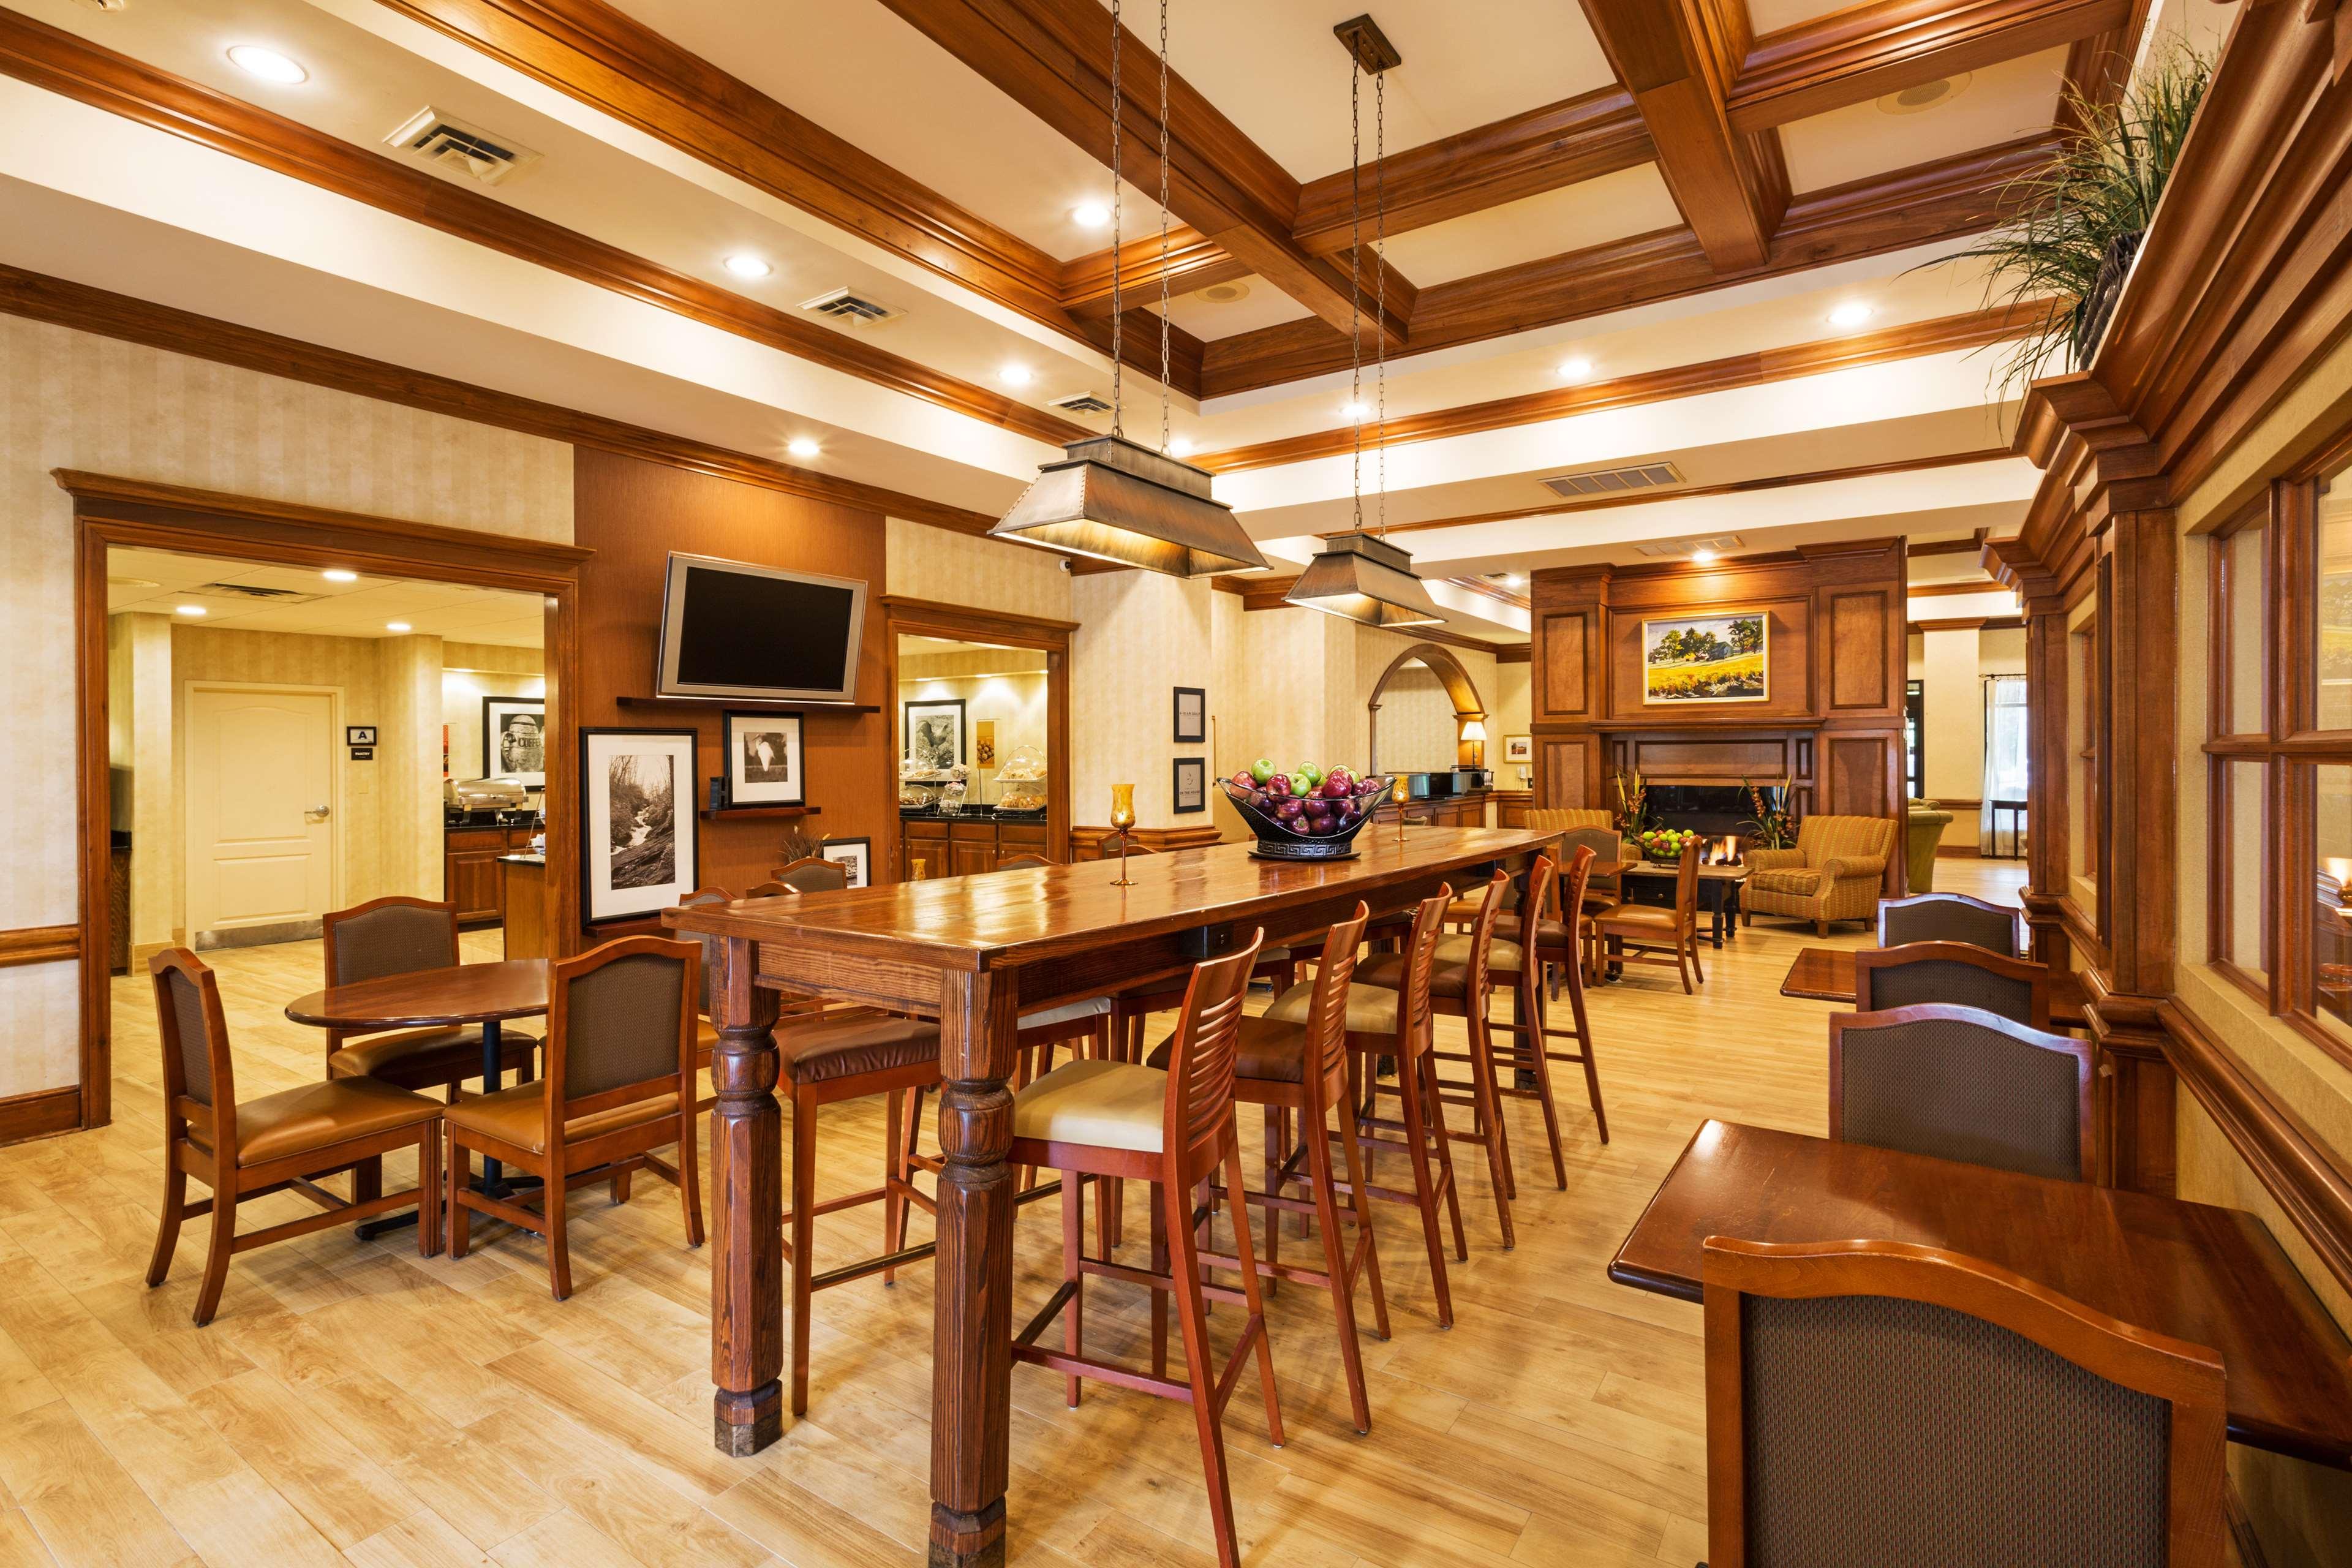 Hampton Inn & Suites Greenville/Spartanburg I-85 image 13